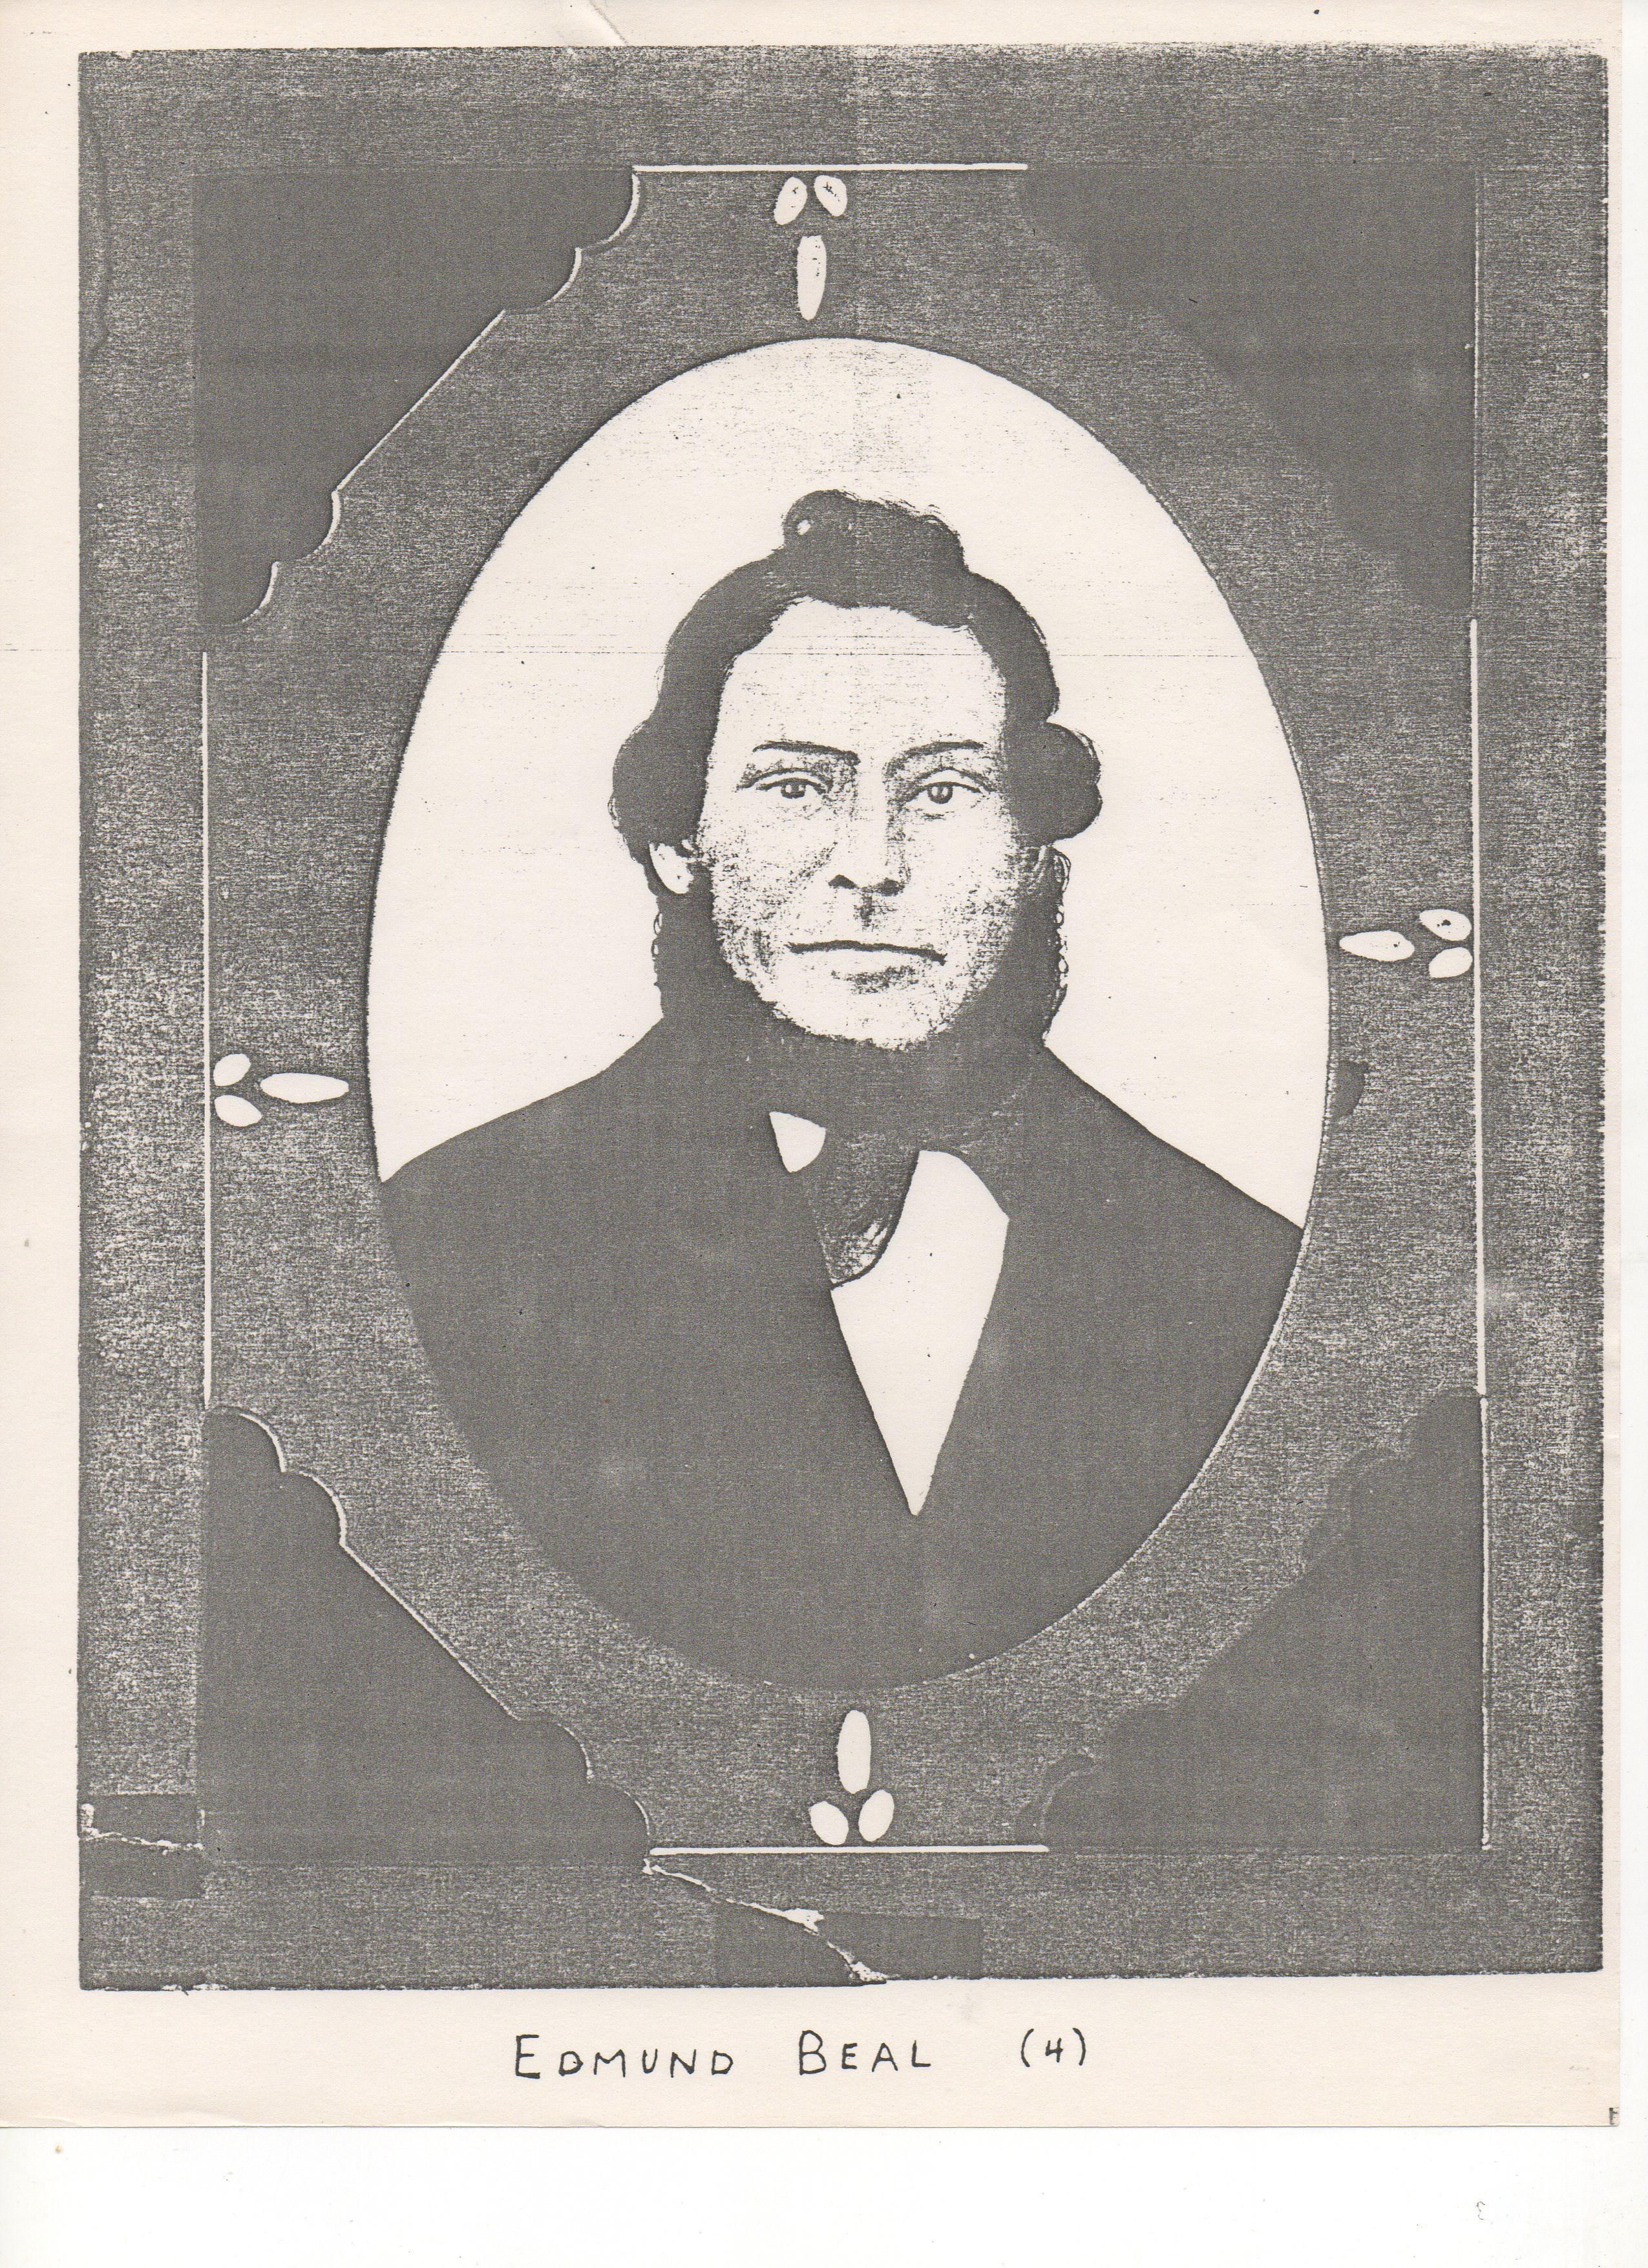 Edmund Beal